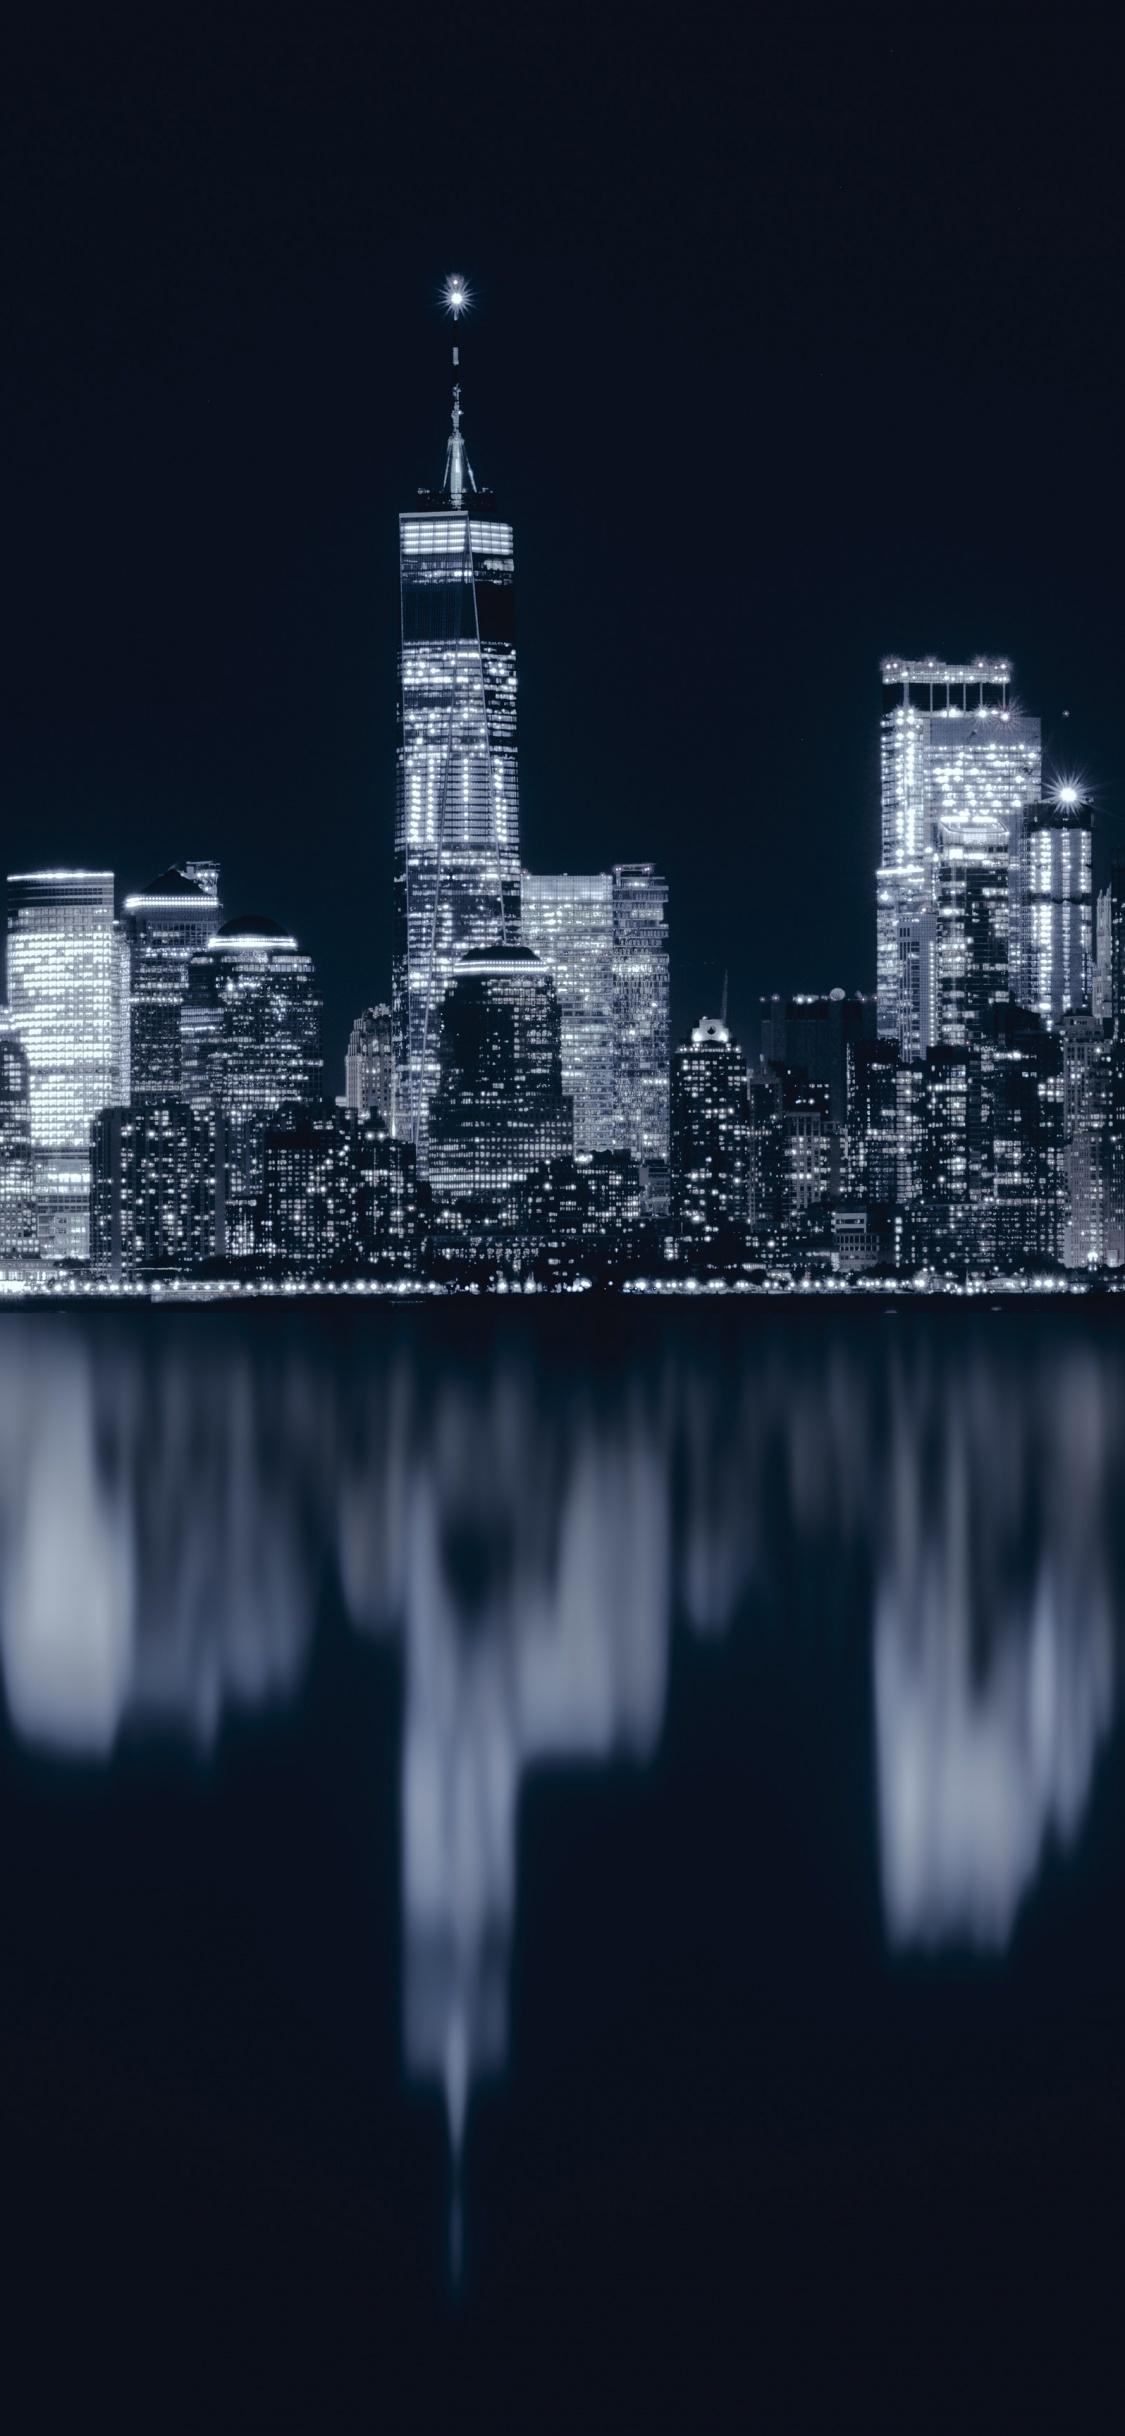 New York City 4k Wallpaper Night Cityscape City Lights Reflections Dark 5k World 1603